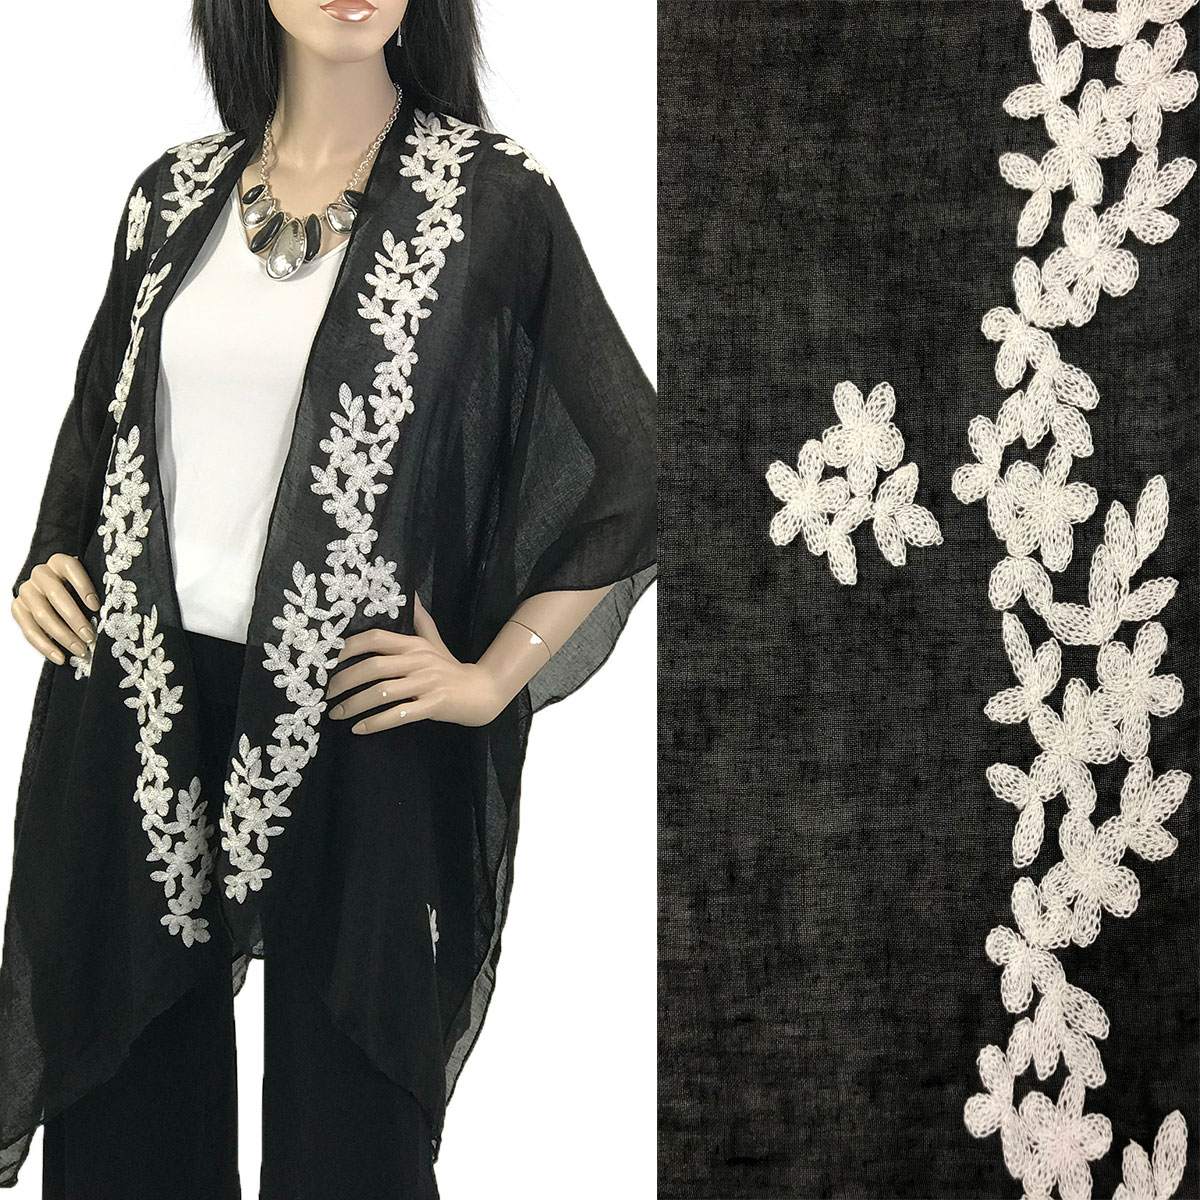 Kimono - Embroidered Floral 901 - Black